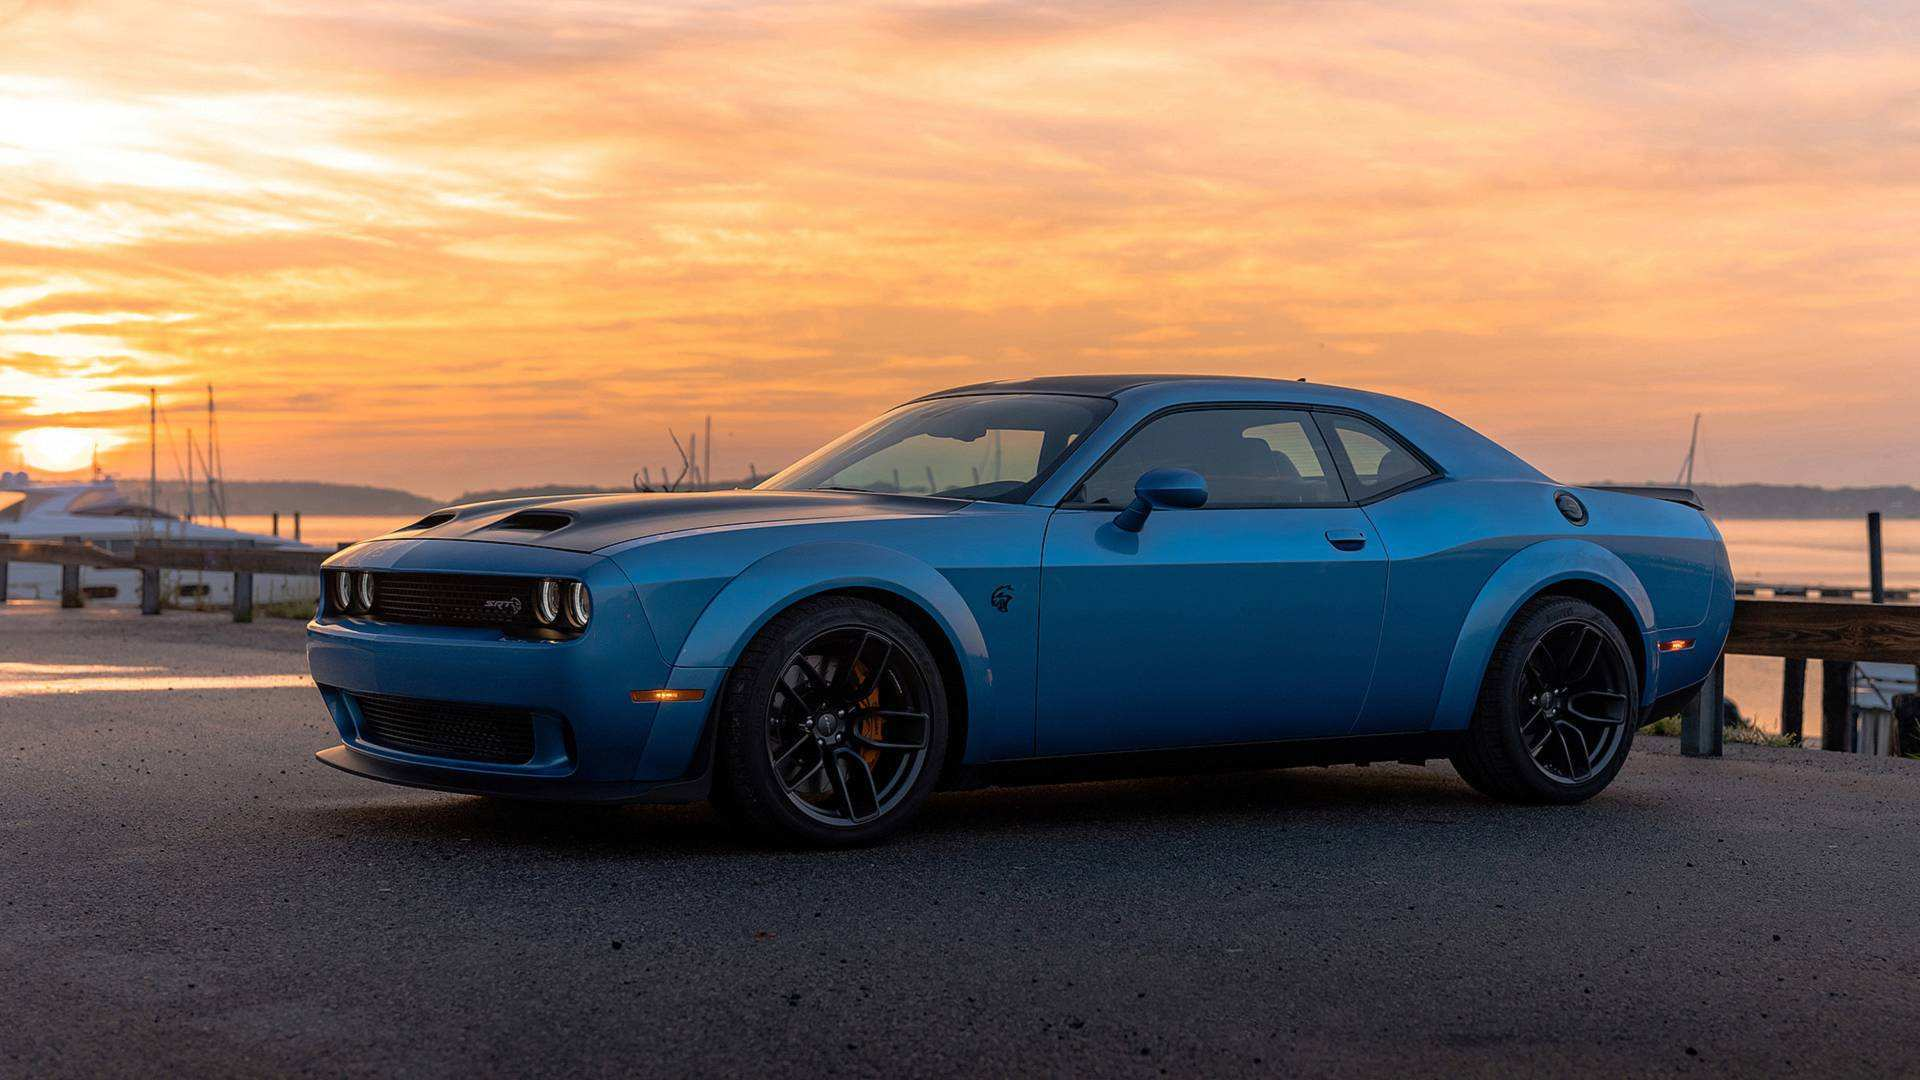 88 New New 2019 Zr1 Vs Dodge Demon Interior Pricing with New 2019 Zr1 Vs Dodge Demon Interior